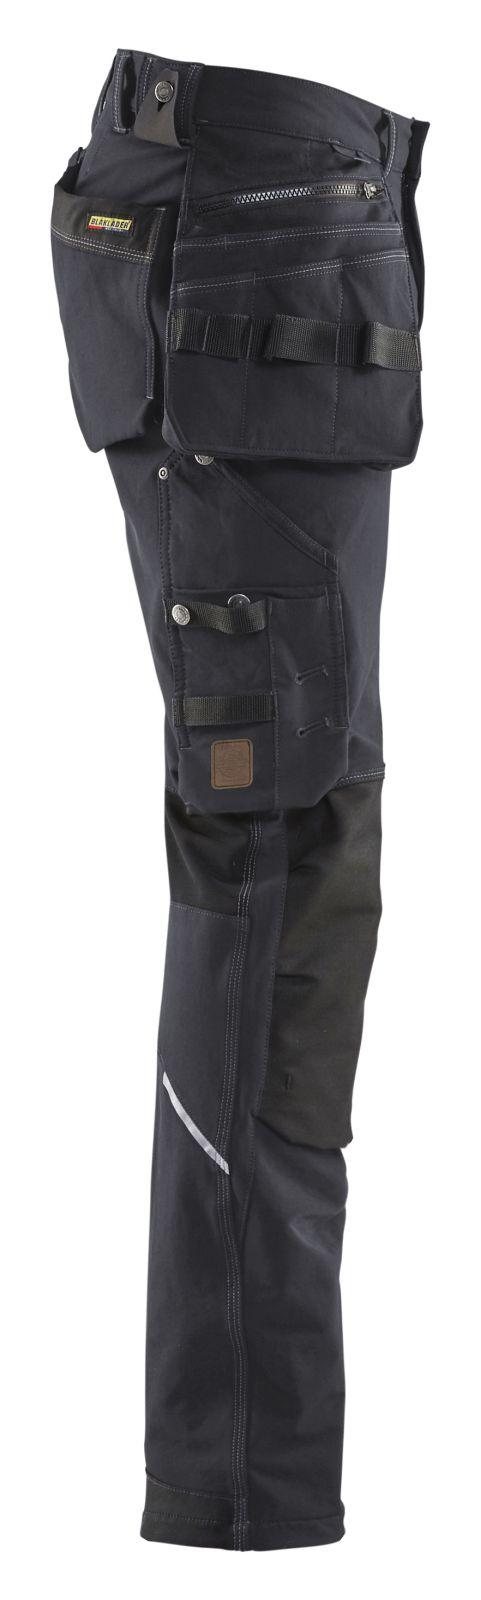 Blaklader Werkbroeken 19981644 met Stretch donkergrijs-zwart(9899)